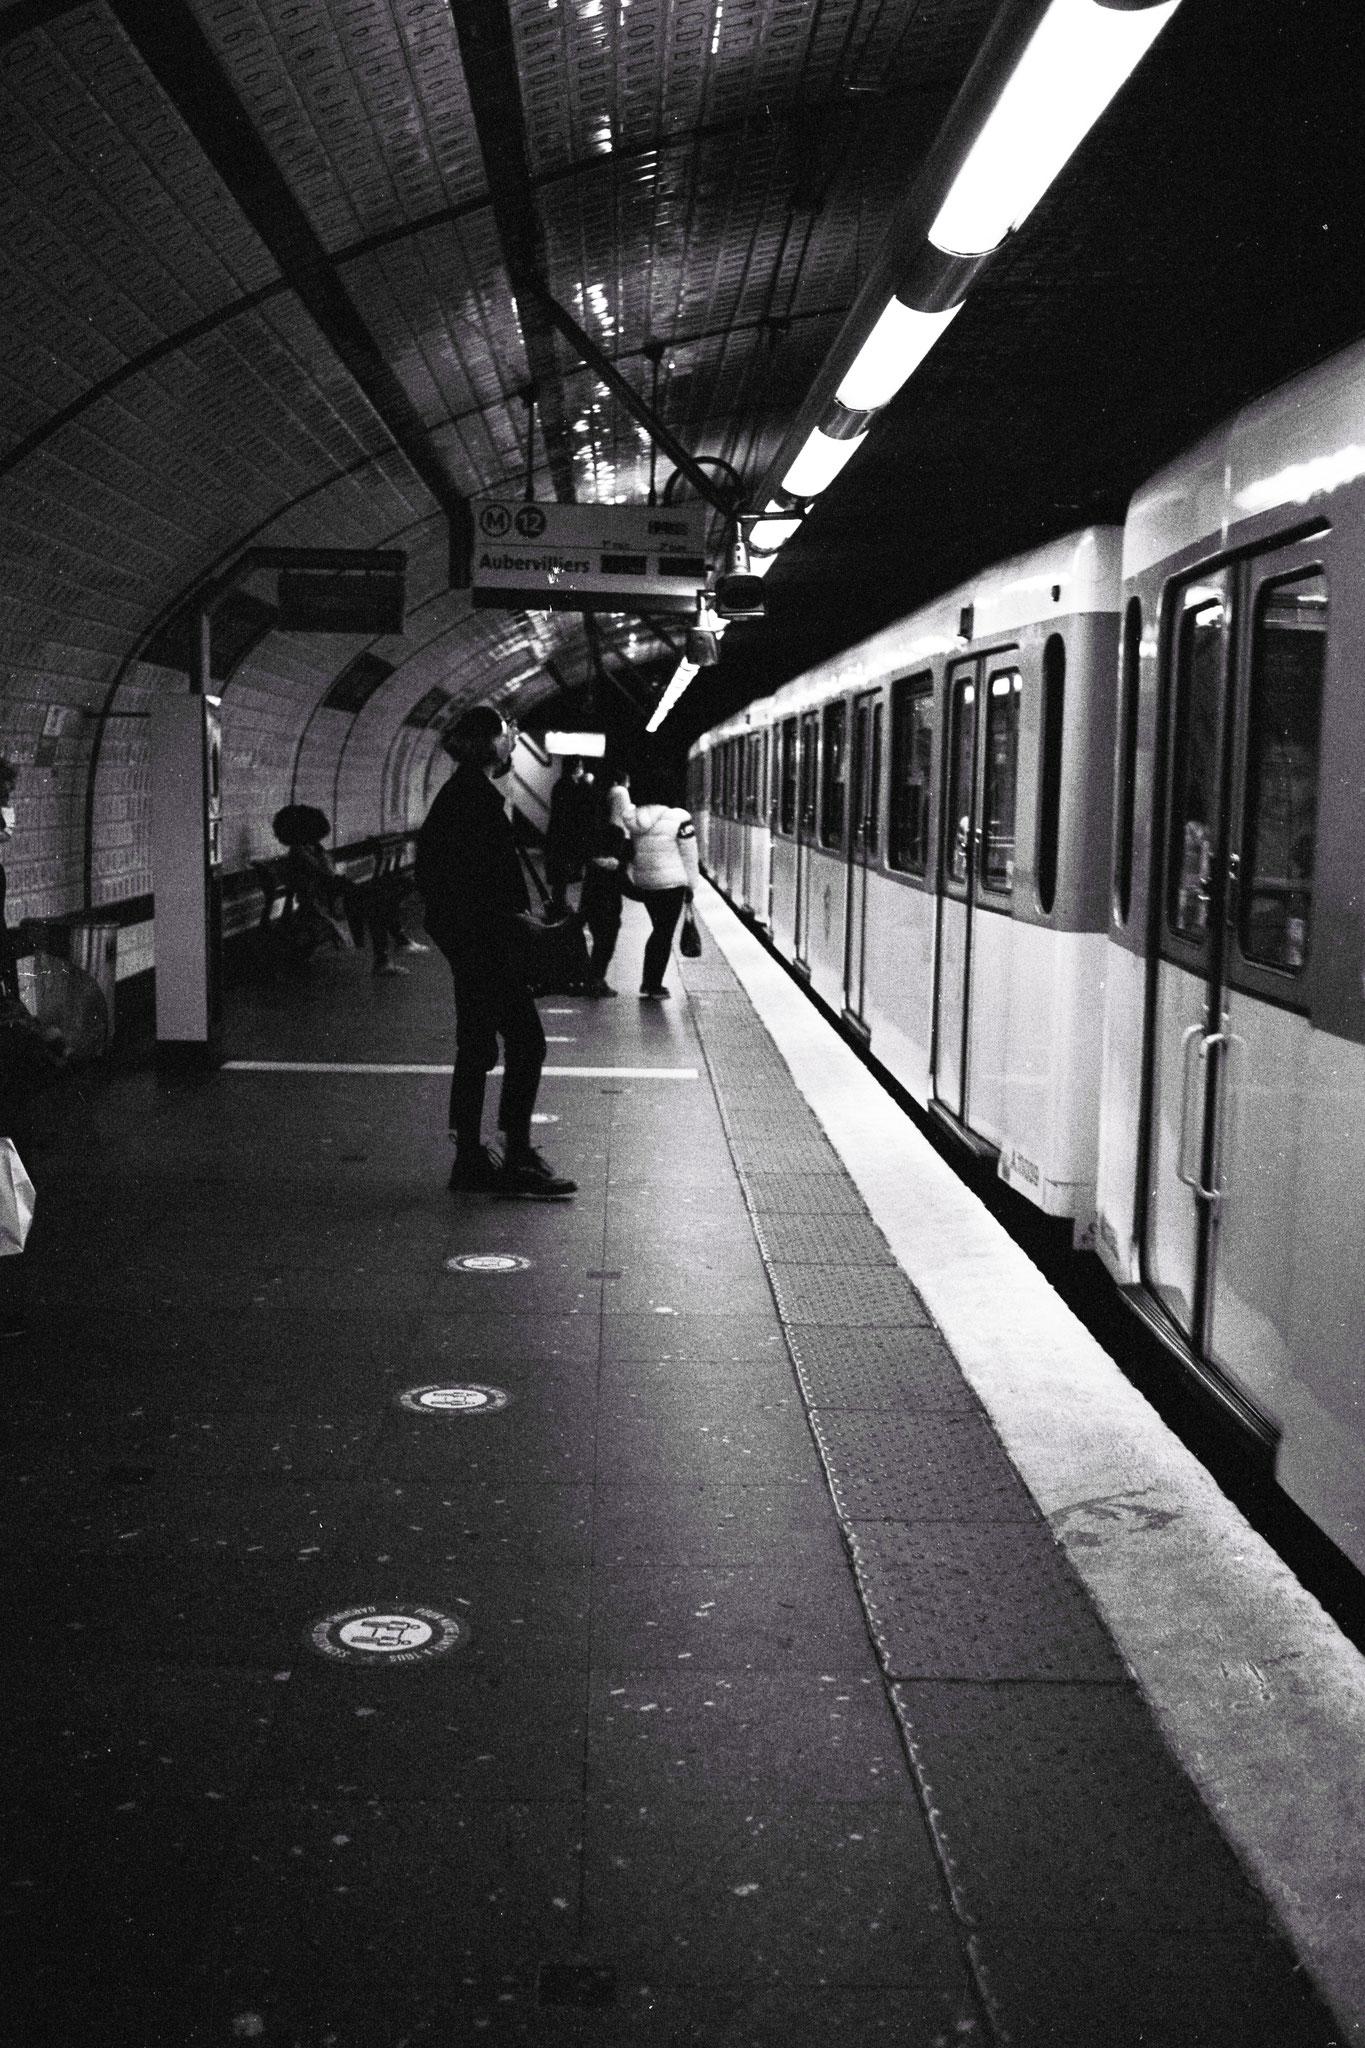 """Unknown destination"" - Station Concorde (M°12), Paris (2021). Rollei Blackbird Creative 64 ASA. © Clémence Rougetet"